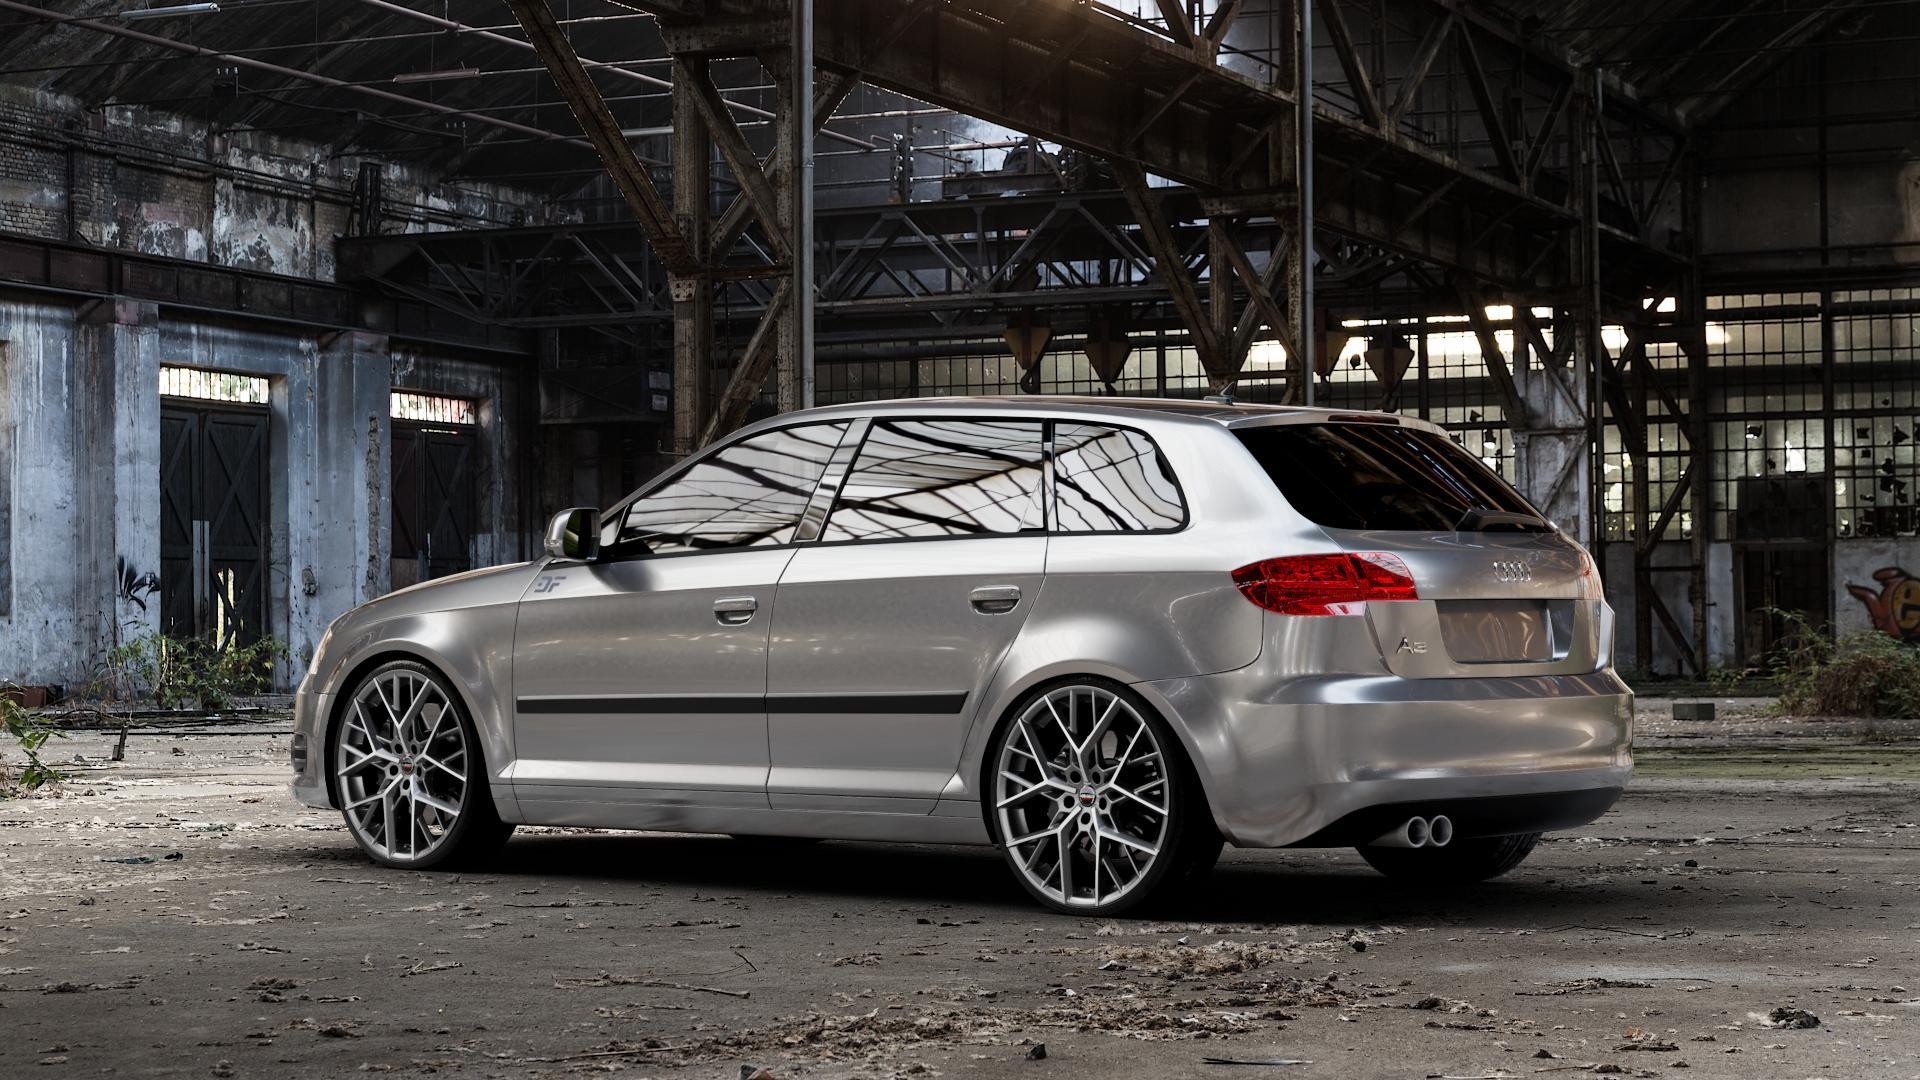 Borbet BY titan polished matt Felge mit Reifen grau in 20Zoll Alufelge auf silbernem Audi A3 Typ 8P (Sportback) 1,6l 75kW (102 PS) 2,0l FSI 110kW (150 1,9l TDI 77kW (105 103kW (140 TFSI 147kW (200 85kW (116 100kW (136 1,8l 118kW (160 125kW (170 1,4l 92kW (125 120kW (163 quattro 3,2l V6 184kW (250 S3 195kW (265 1,2l 66kW (90